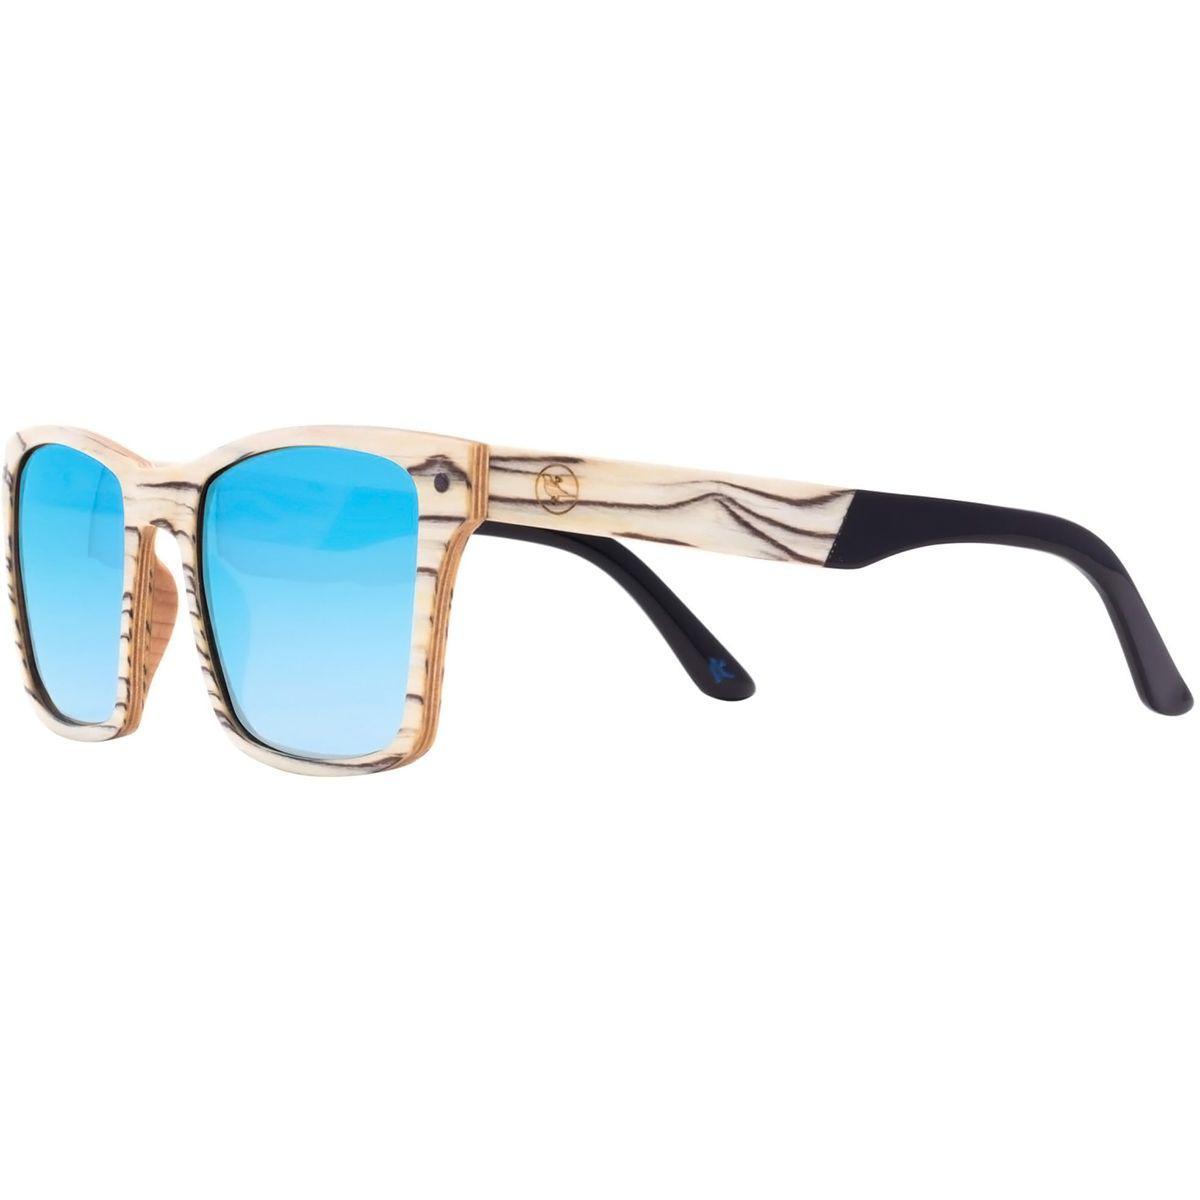 37697f83e4 Lyst - Proof Tamarack Polarized Sunglasses for Men